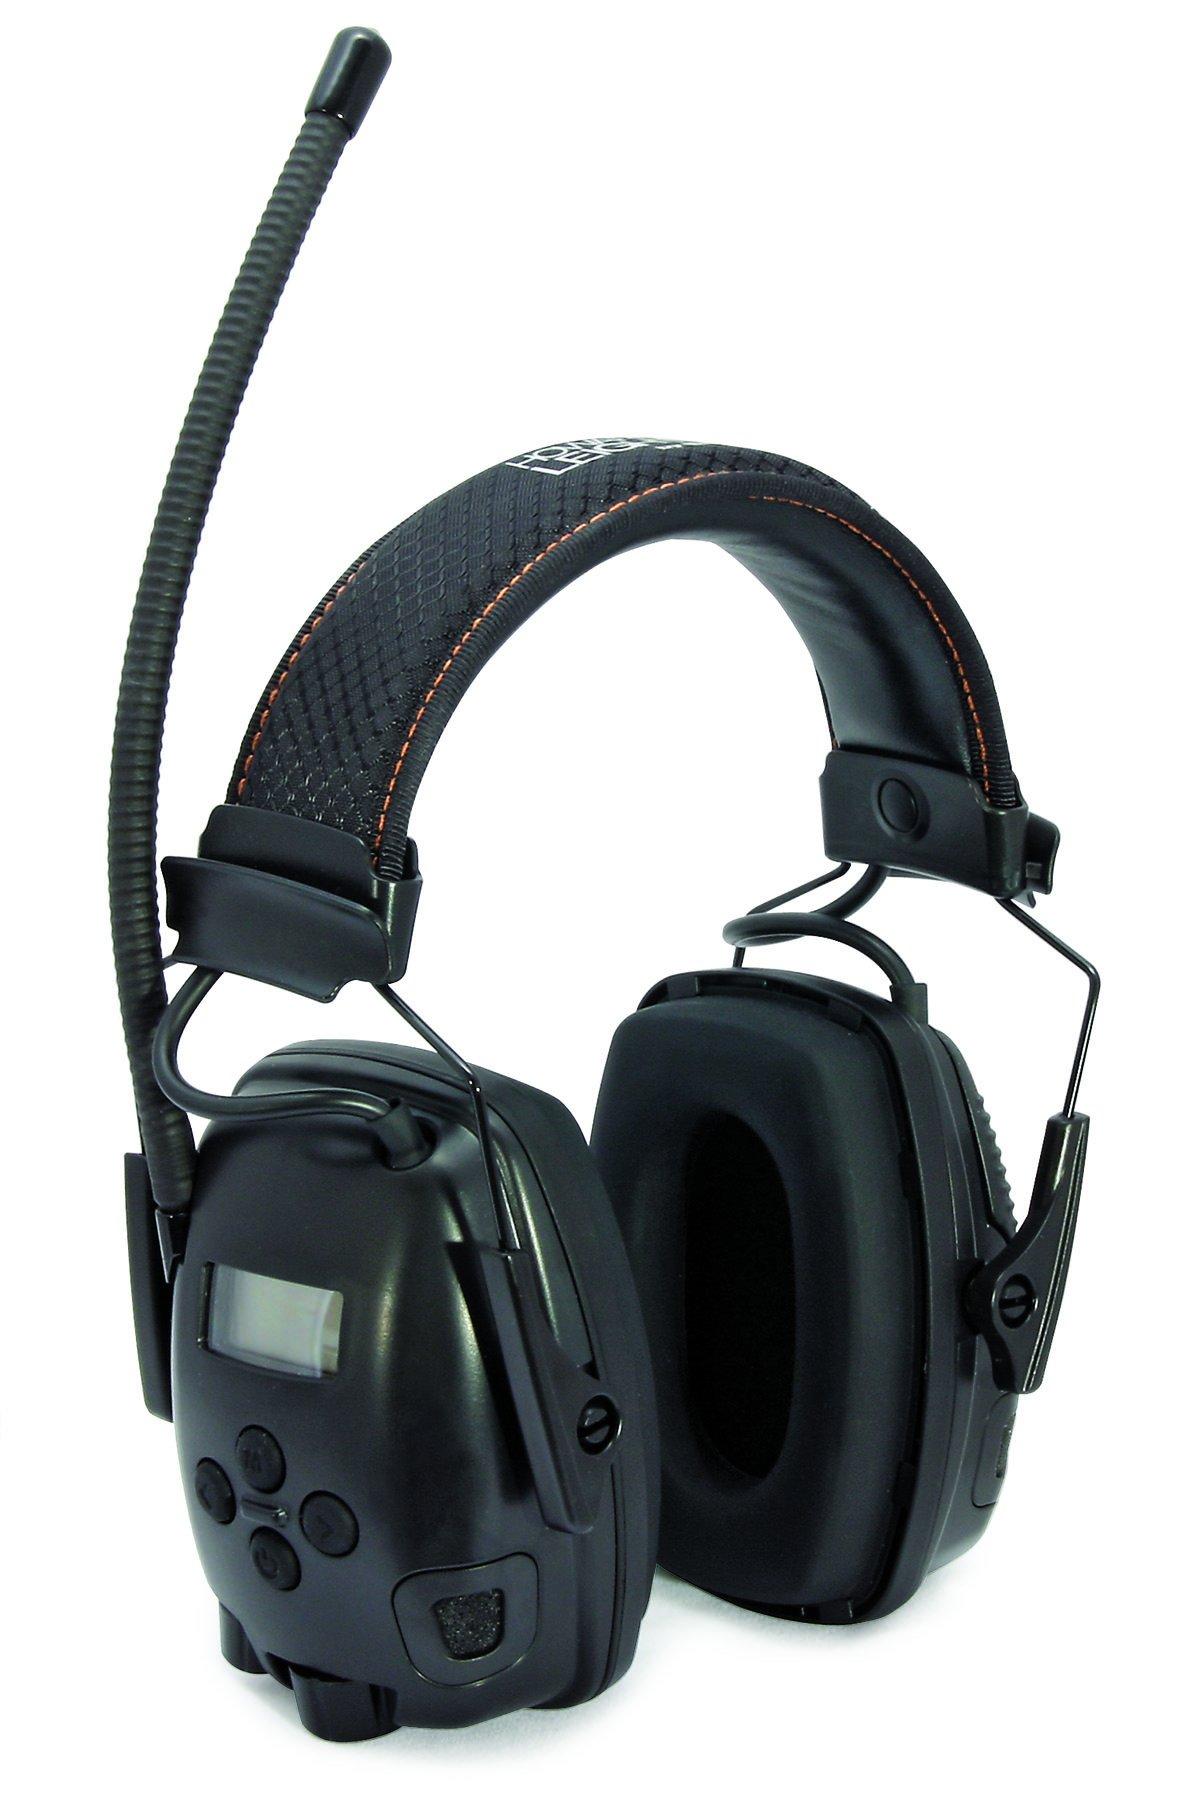 ***BEST PRICE*** Electronic Ear Muff, FM, Black, 25dB